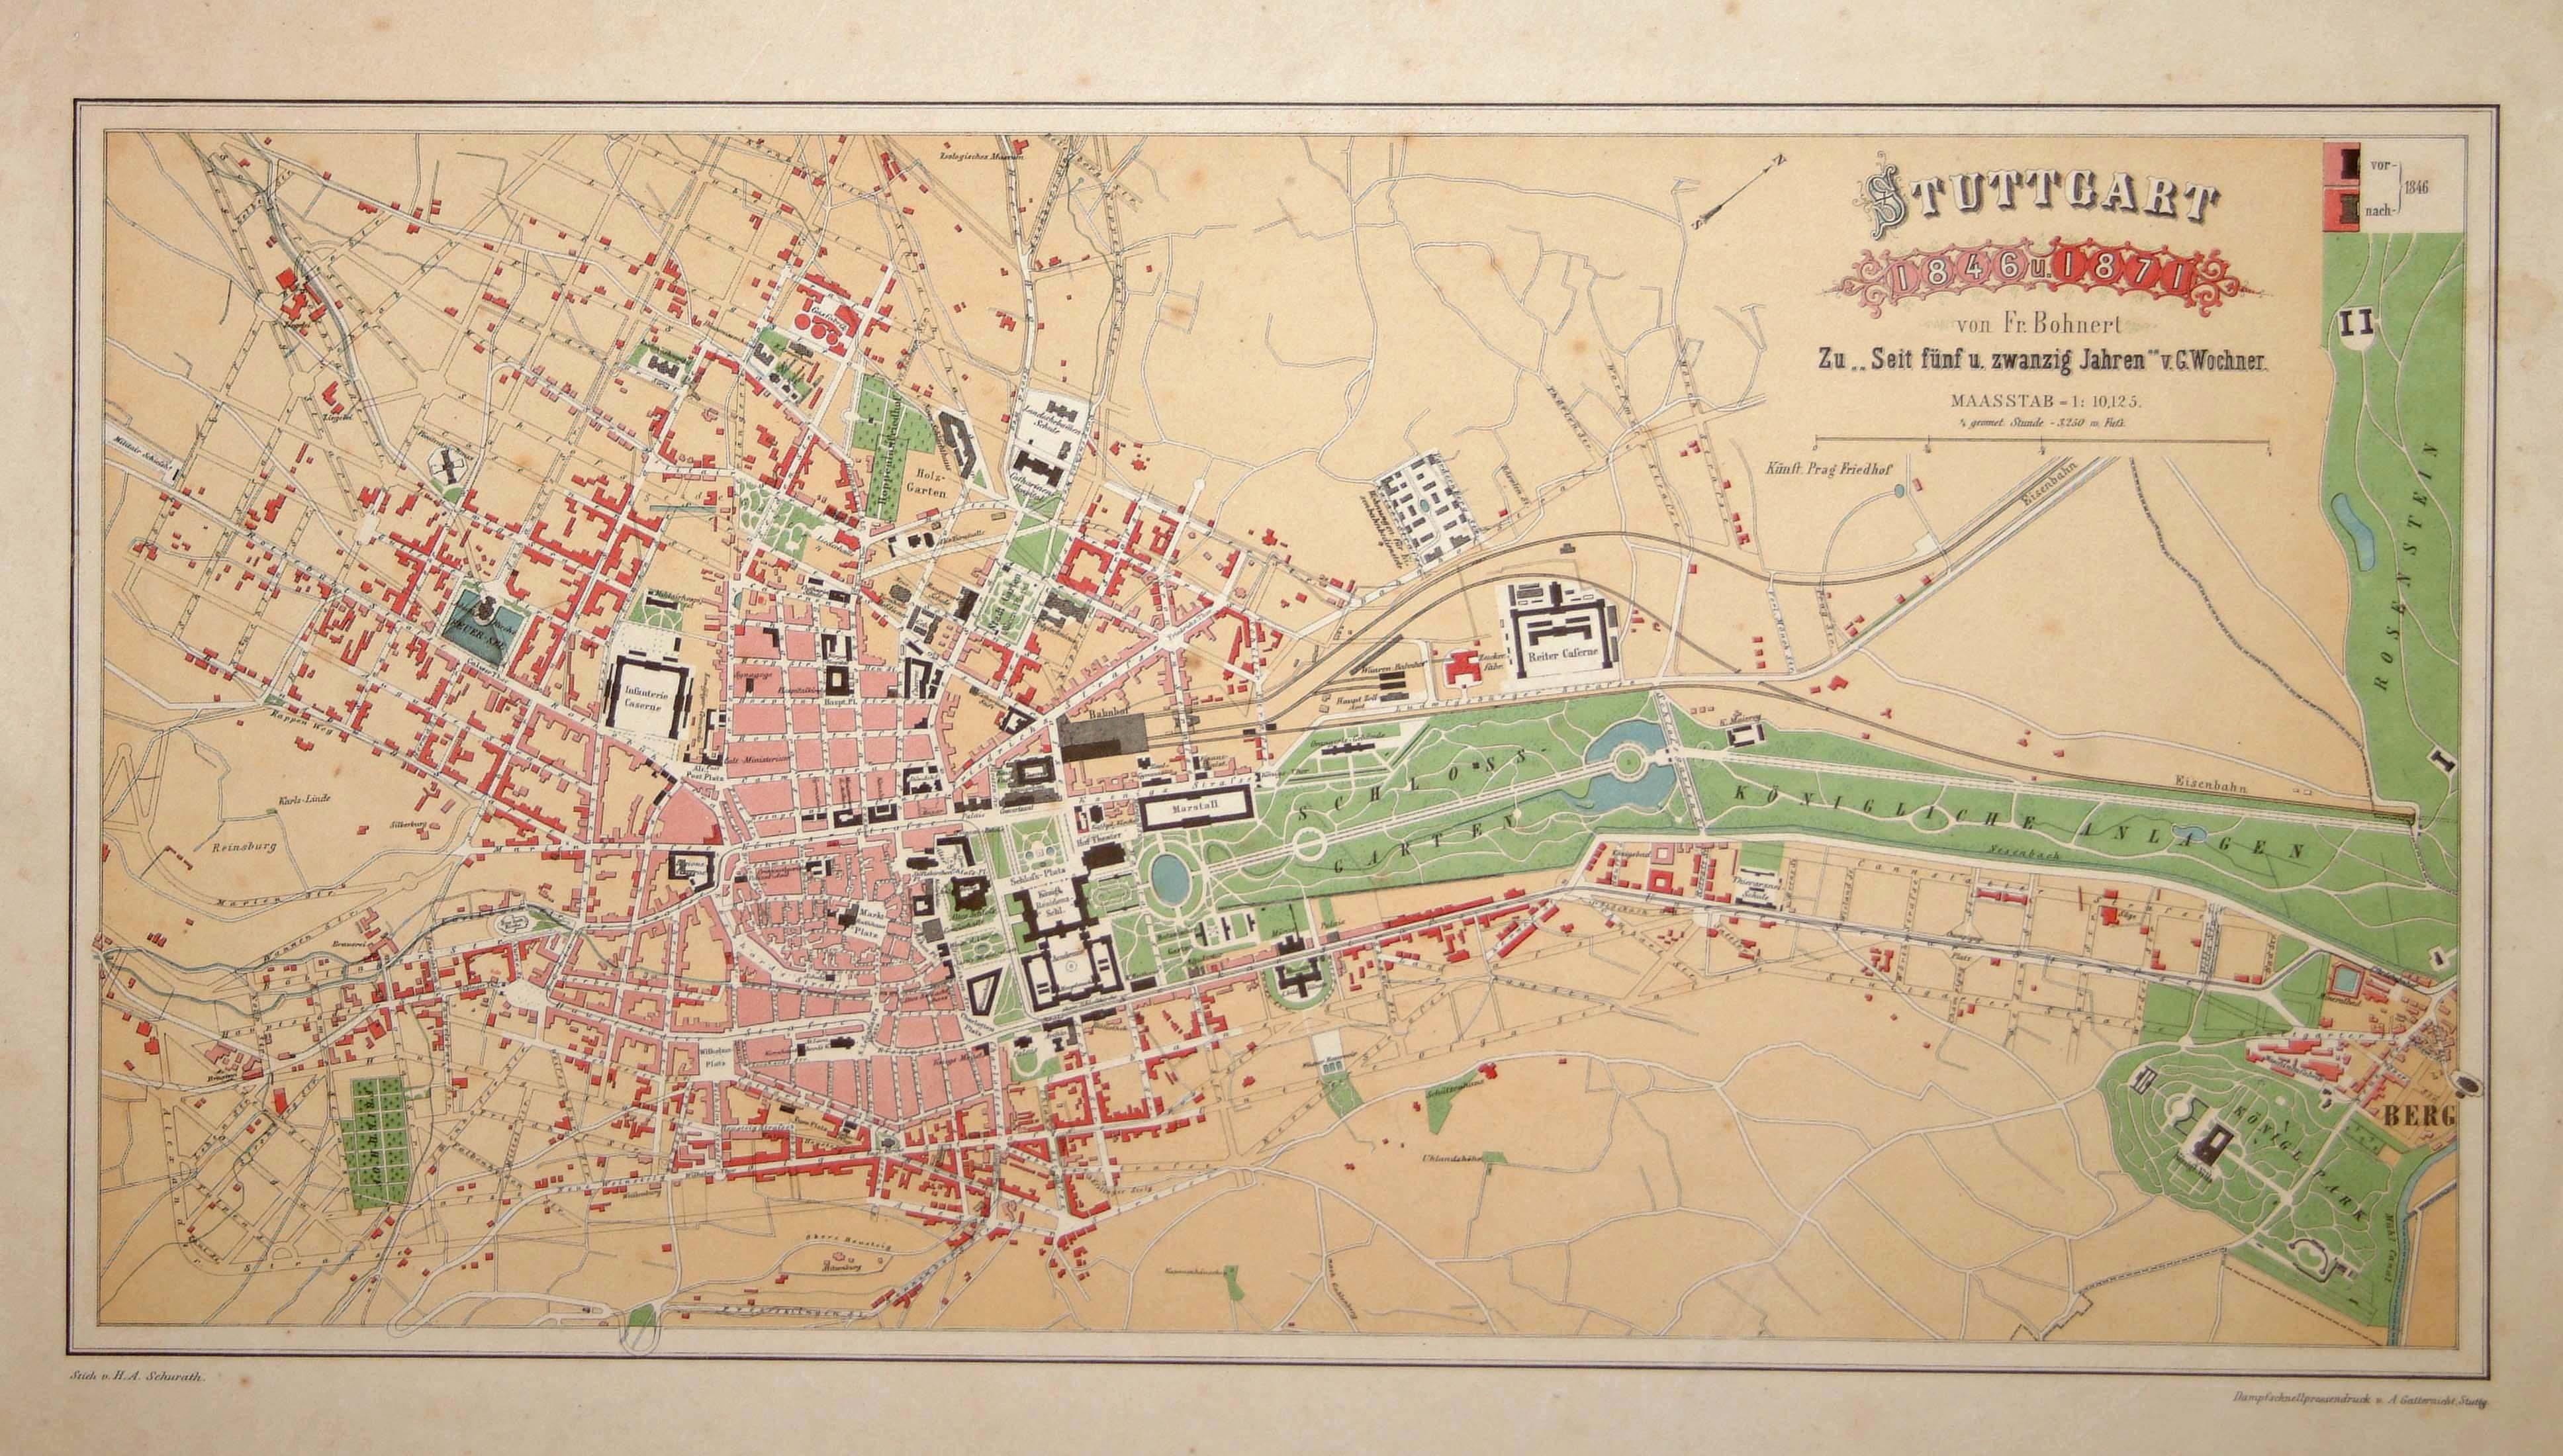 BOHNERT Stuttgart 1846 u 1871